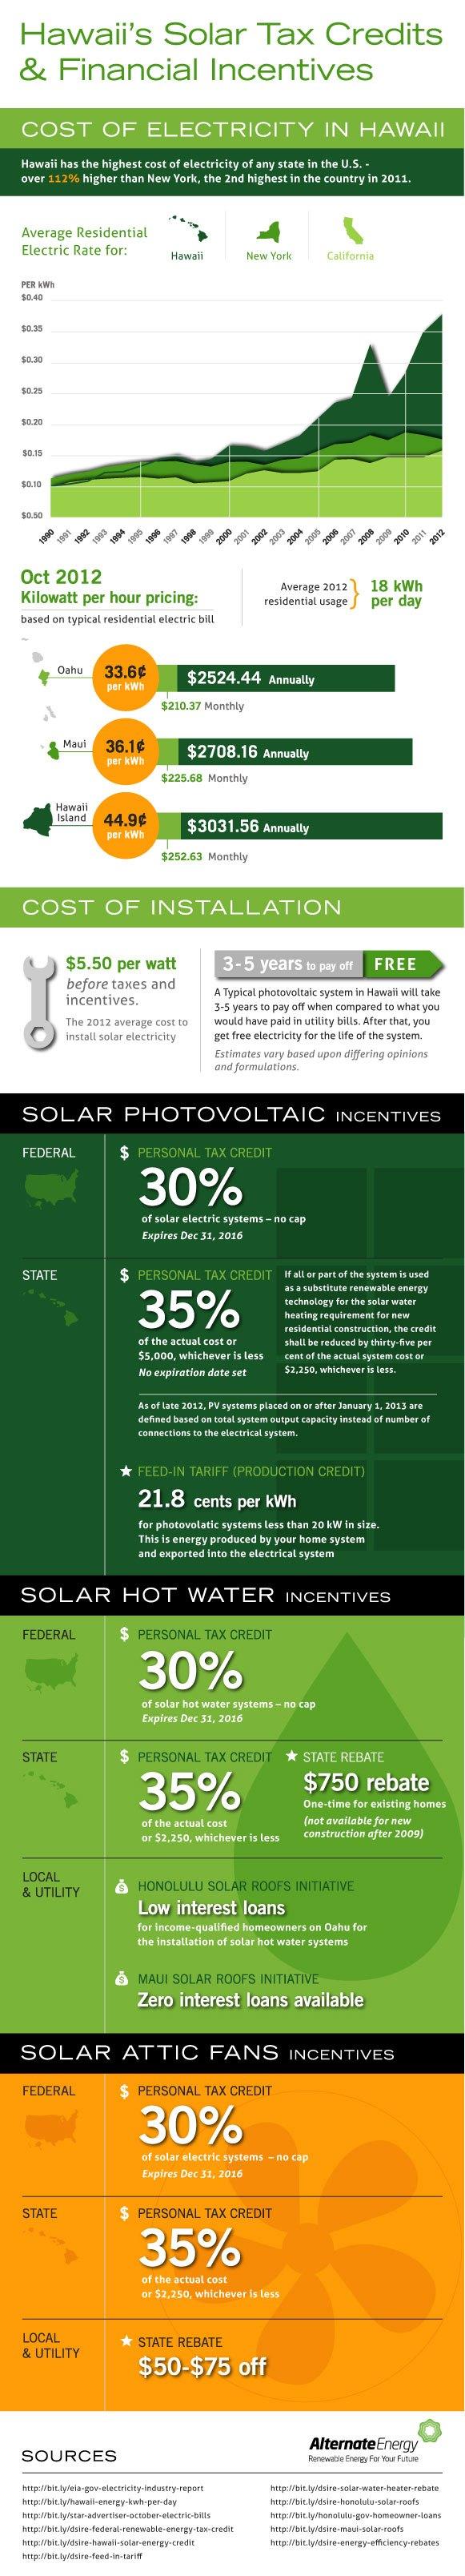 are solar panels worth it hawaii